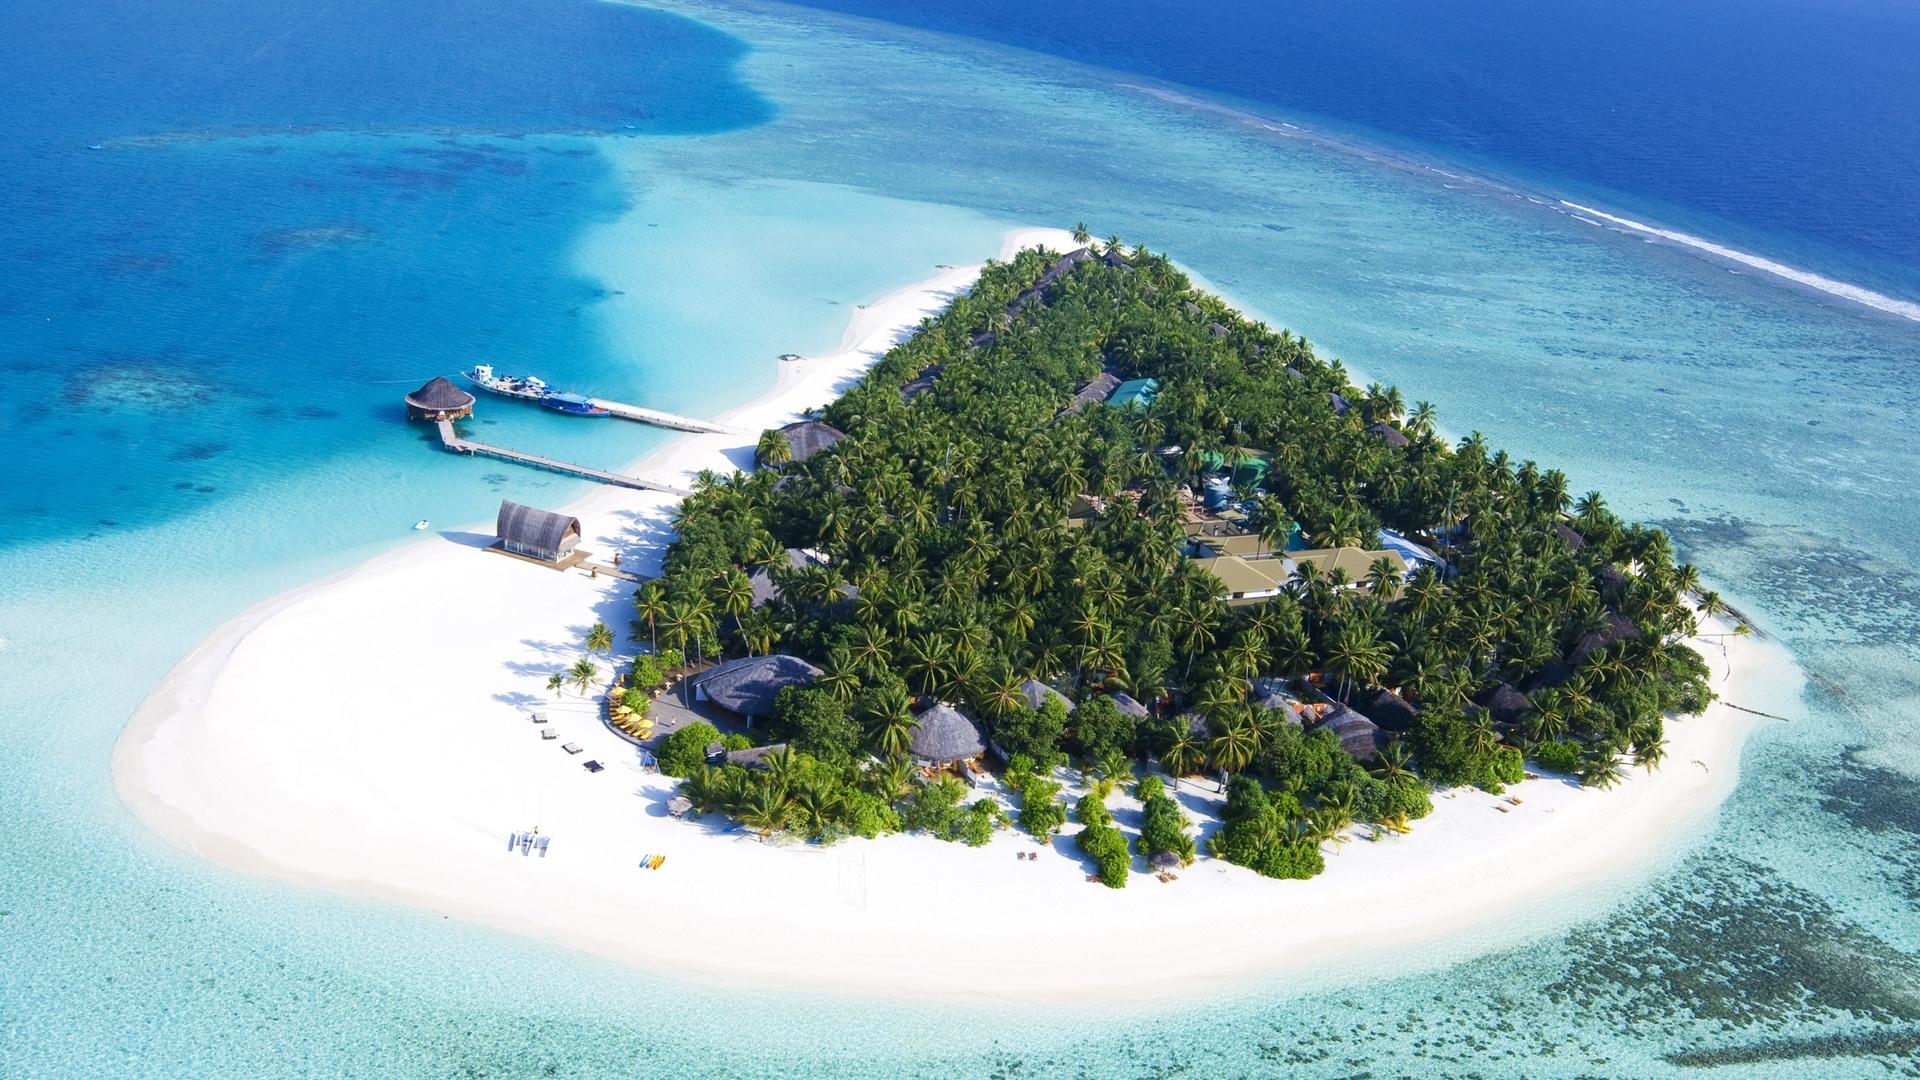 Exotic island wallpaper   1287743 1920x1080